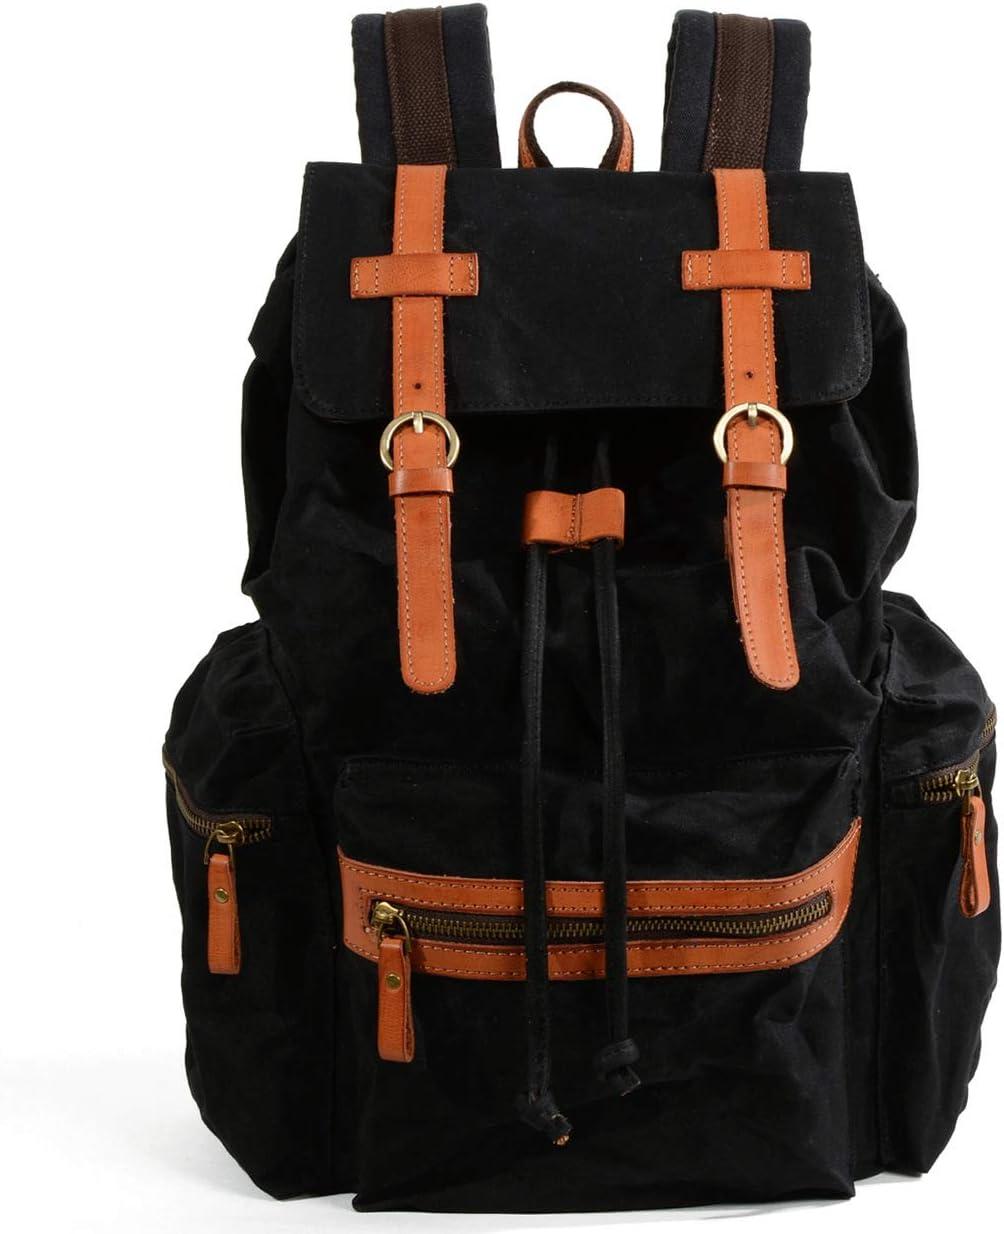 Color : Black TangFeii Backpack Travel Laptop Backpack,Men//Women Backpack Waterproof Vintage Drawstring School Laptop Bag Outdoor Scratch-Resistant